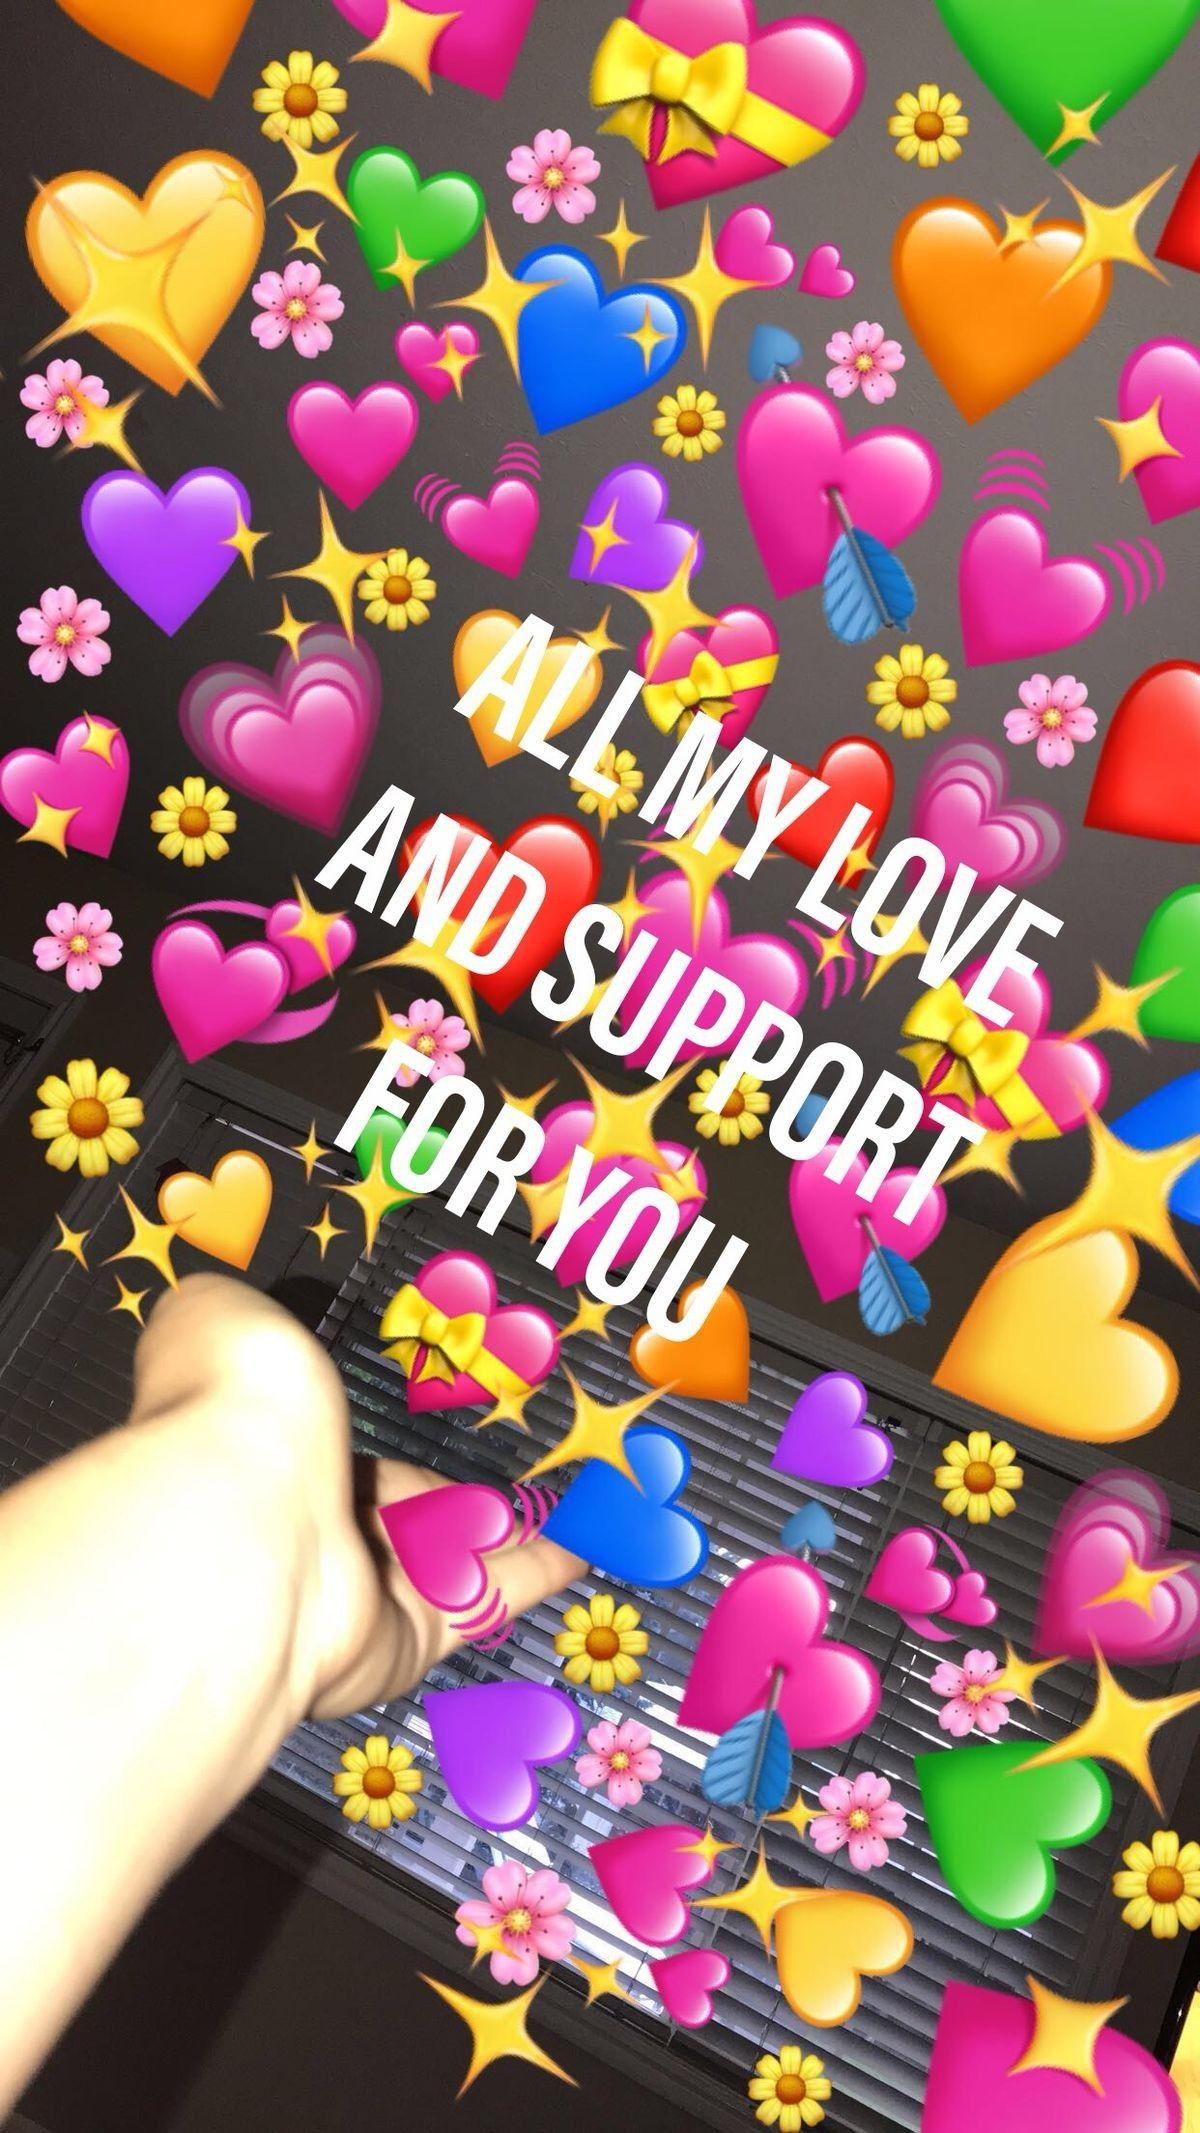 Pin By Brooklyn On Derp Cute Love Memes Love Memes Heart Meme